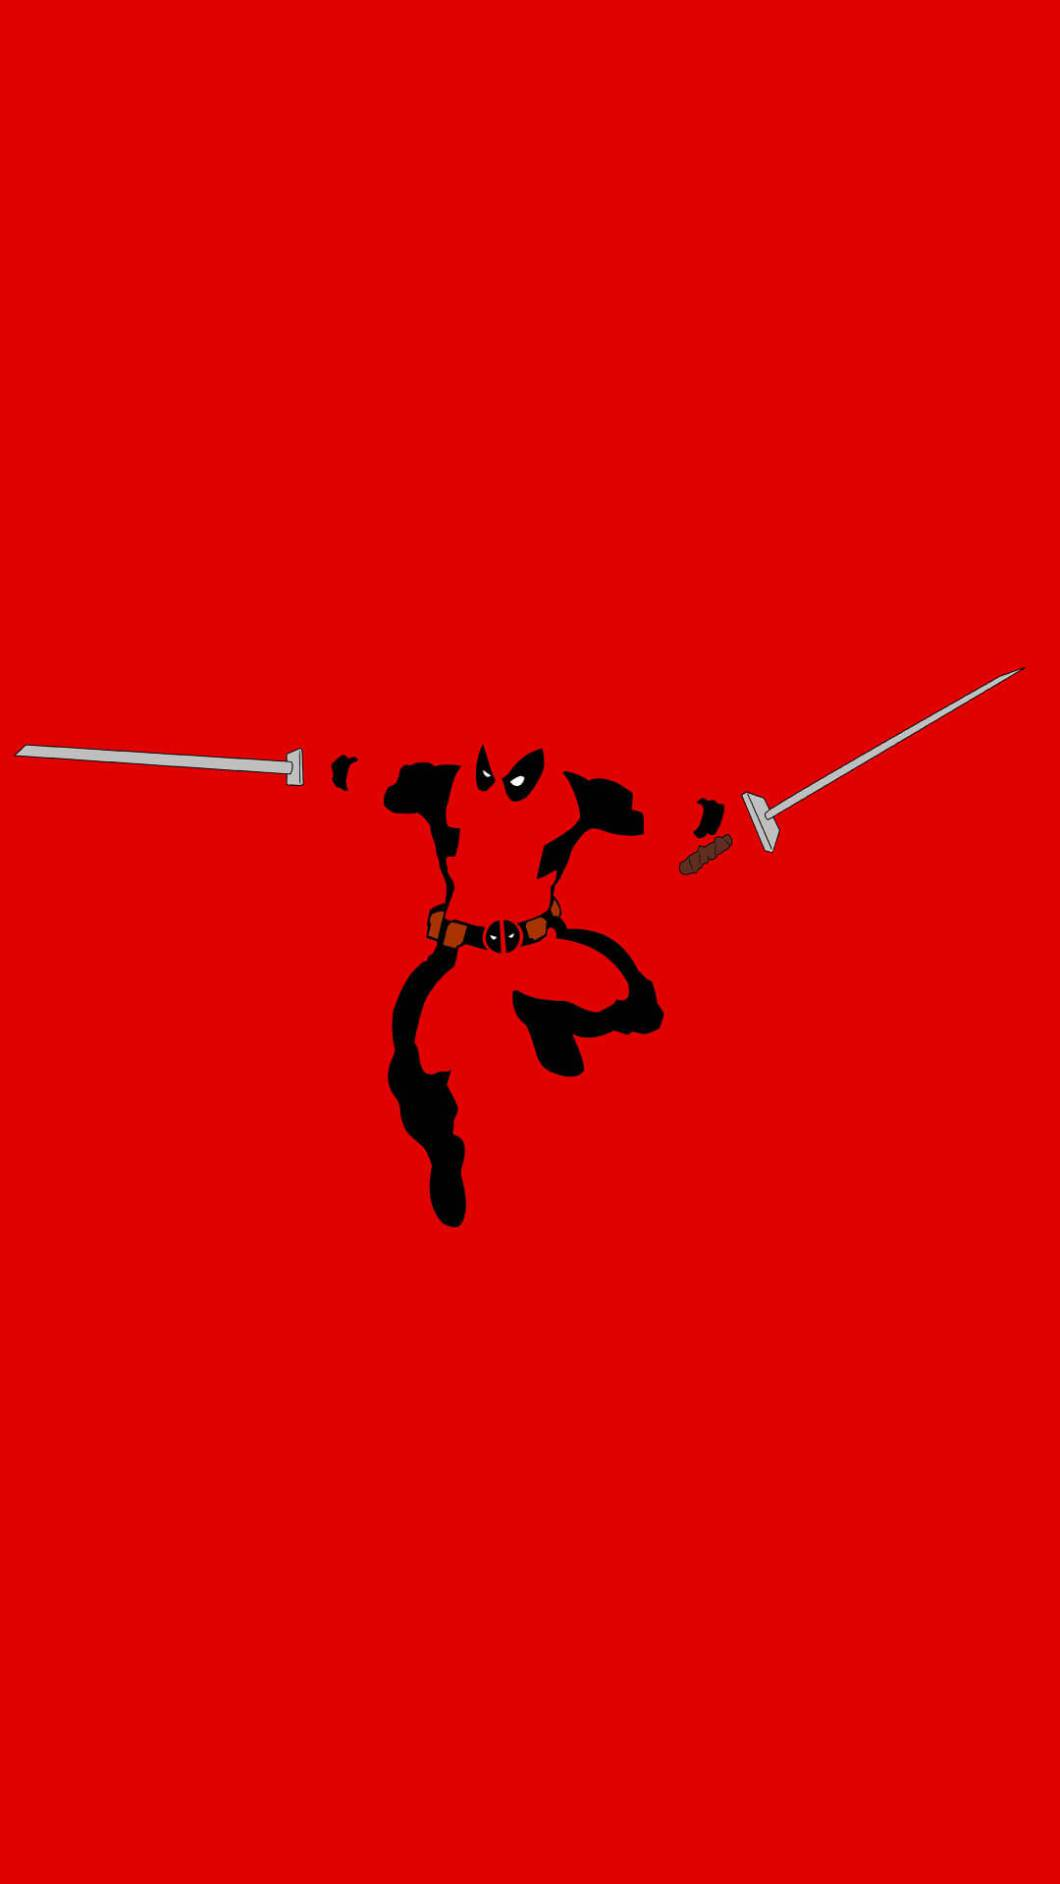 Deadpool Iphone Wallpapers Top Free Deadpool Iphone